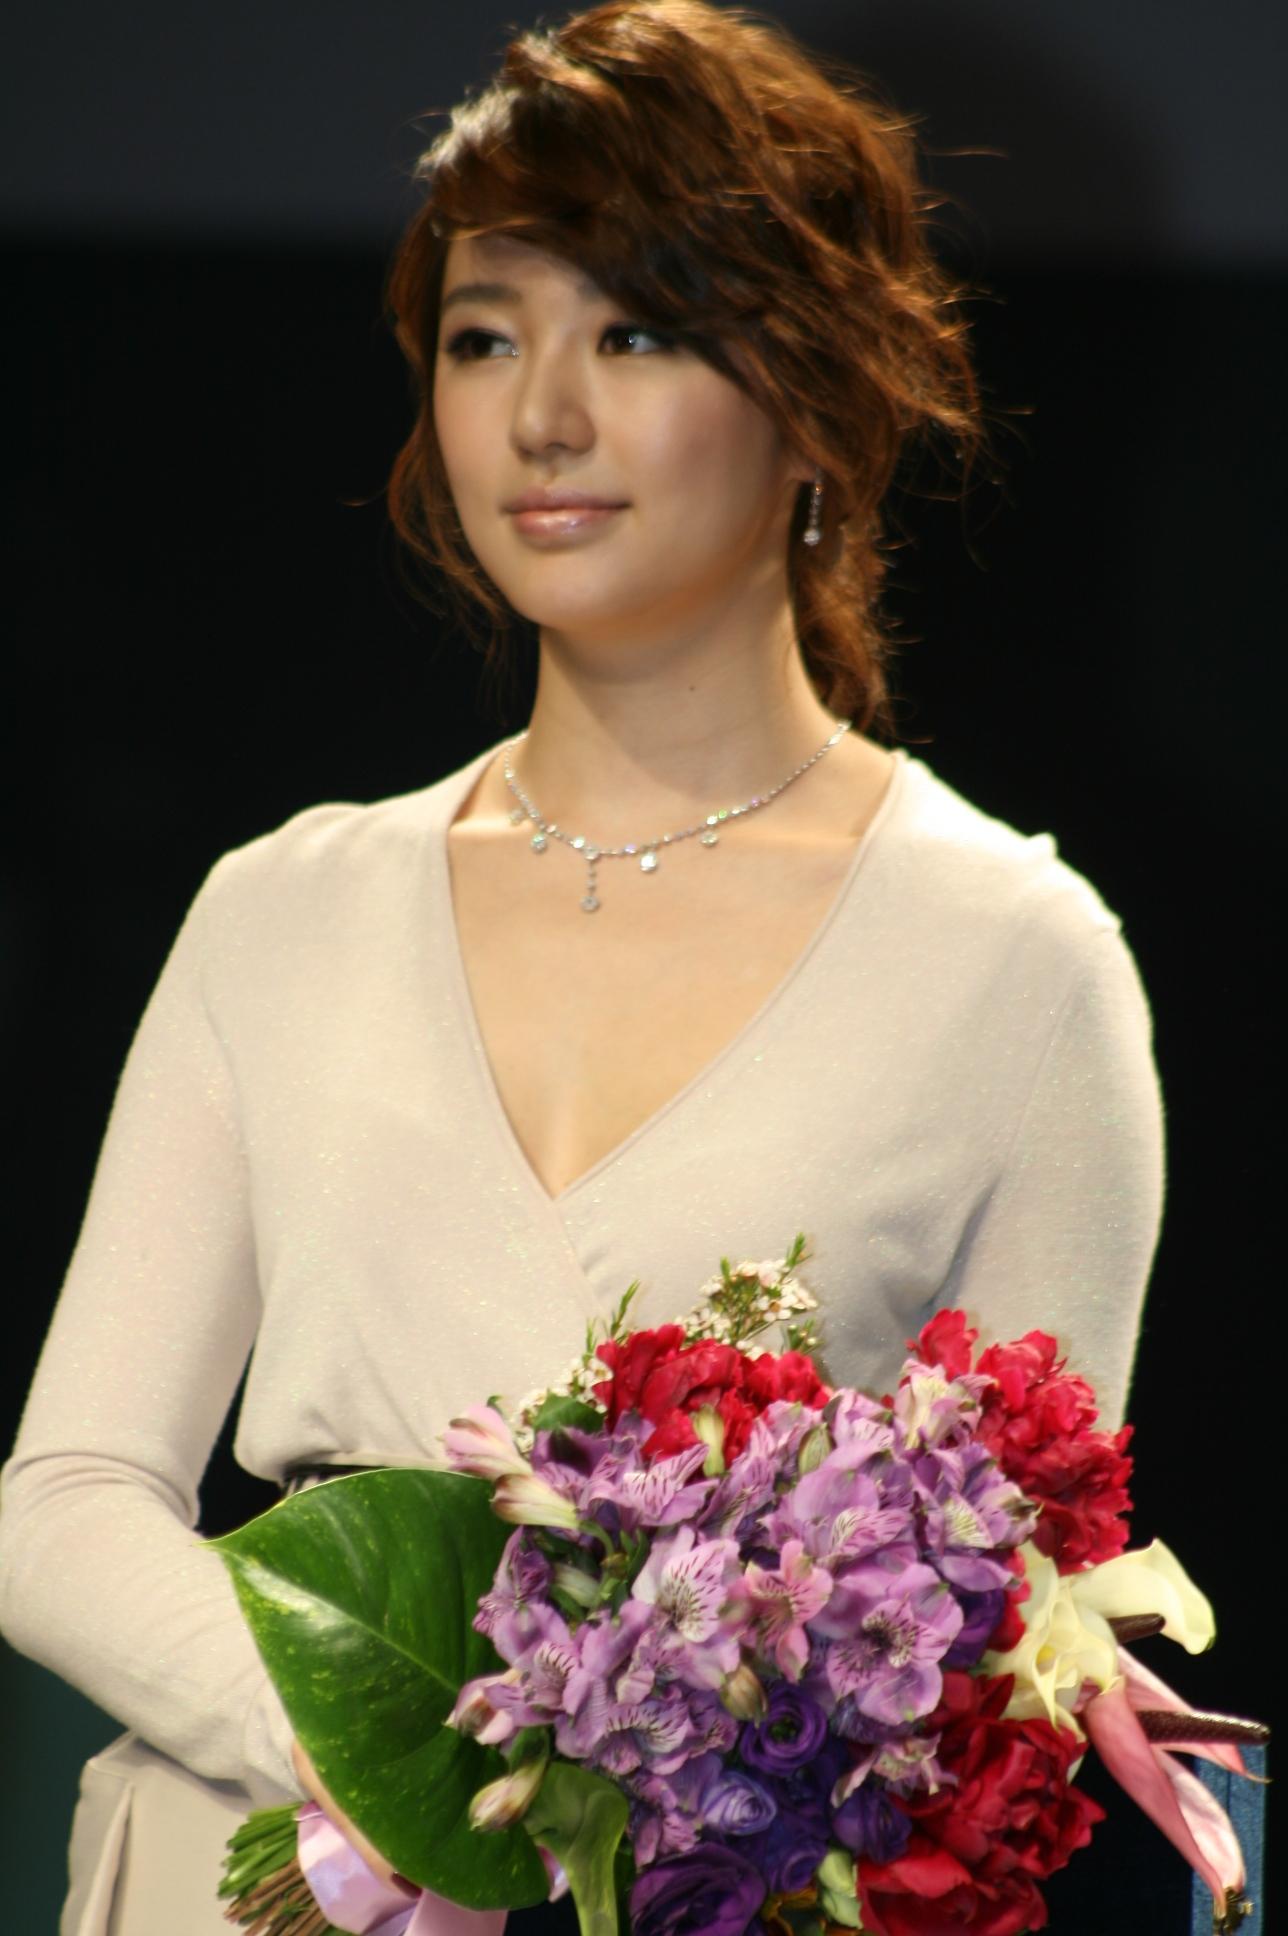 yeen Eun Hye